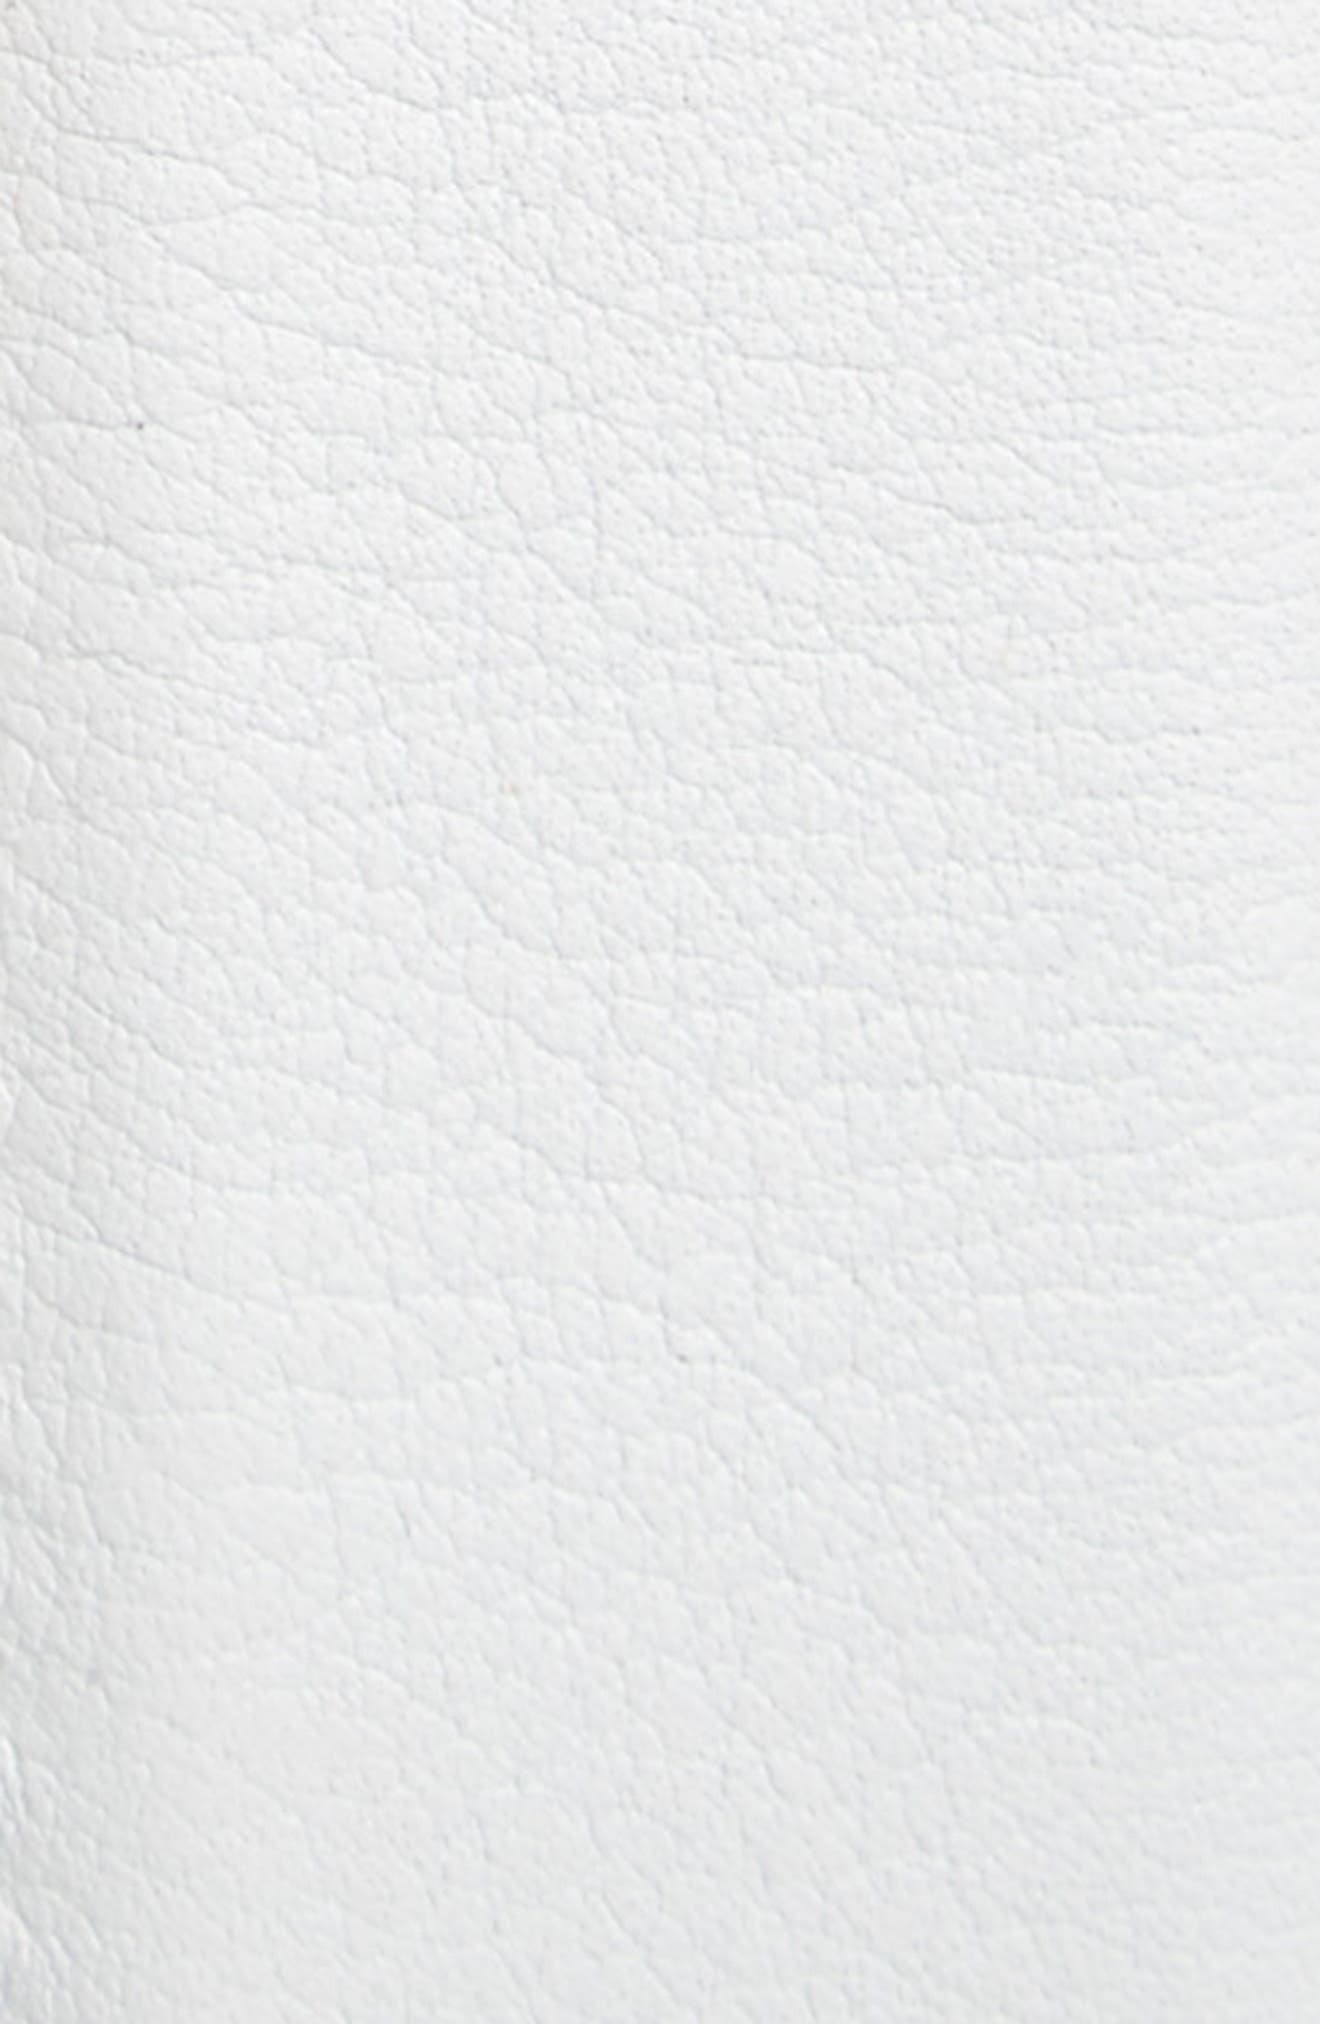 Rugo Leather Belt,                             Alternate thumbnail 2, color,                             100